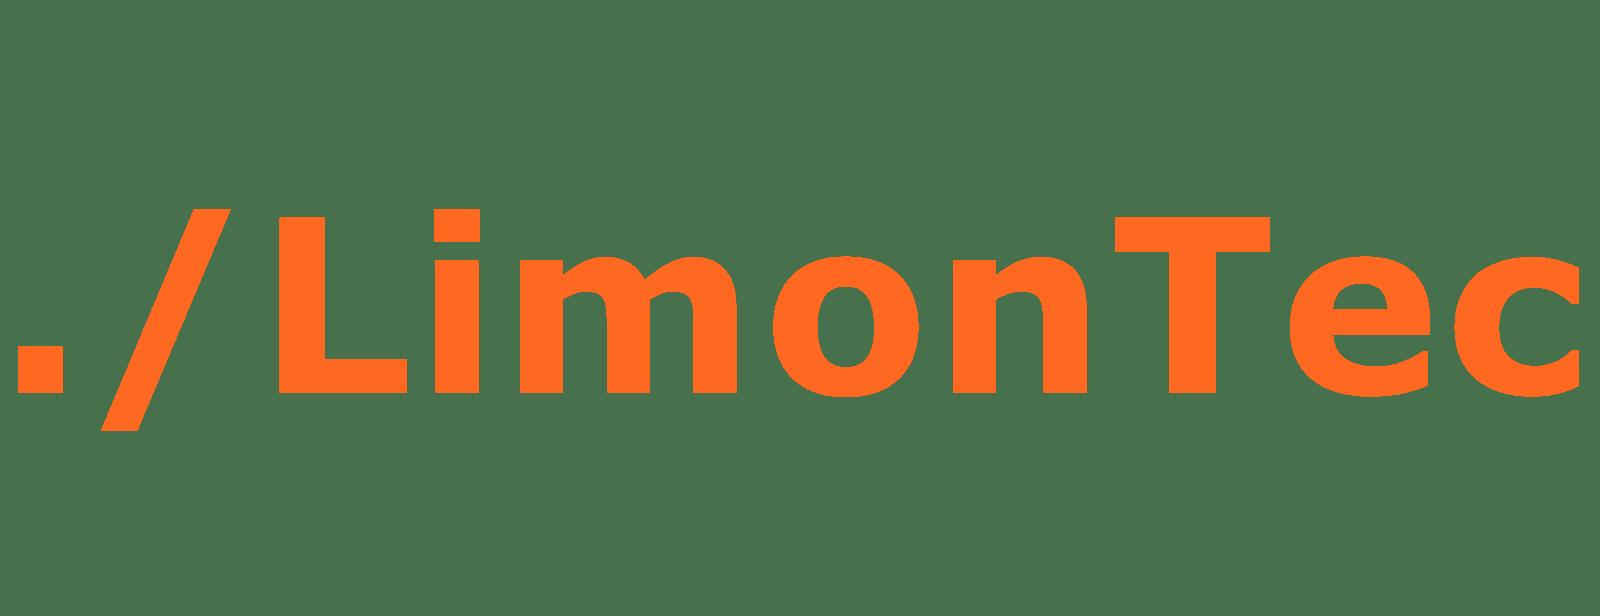 DeepFakes - criando vídeos falsos - FakeApp tutorial   Limon Tec